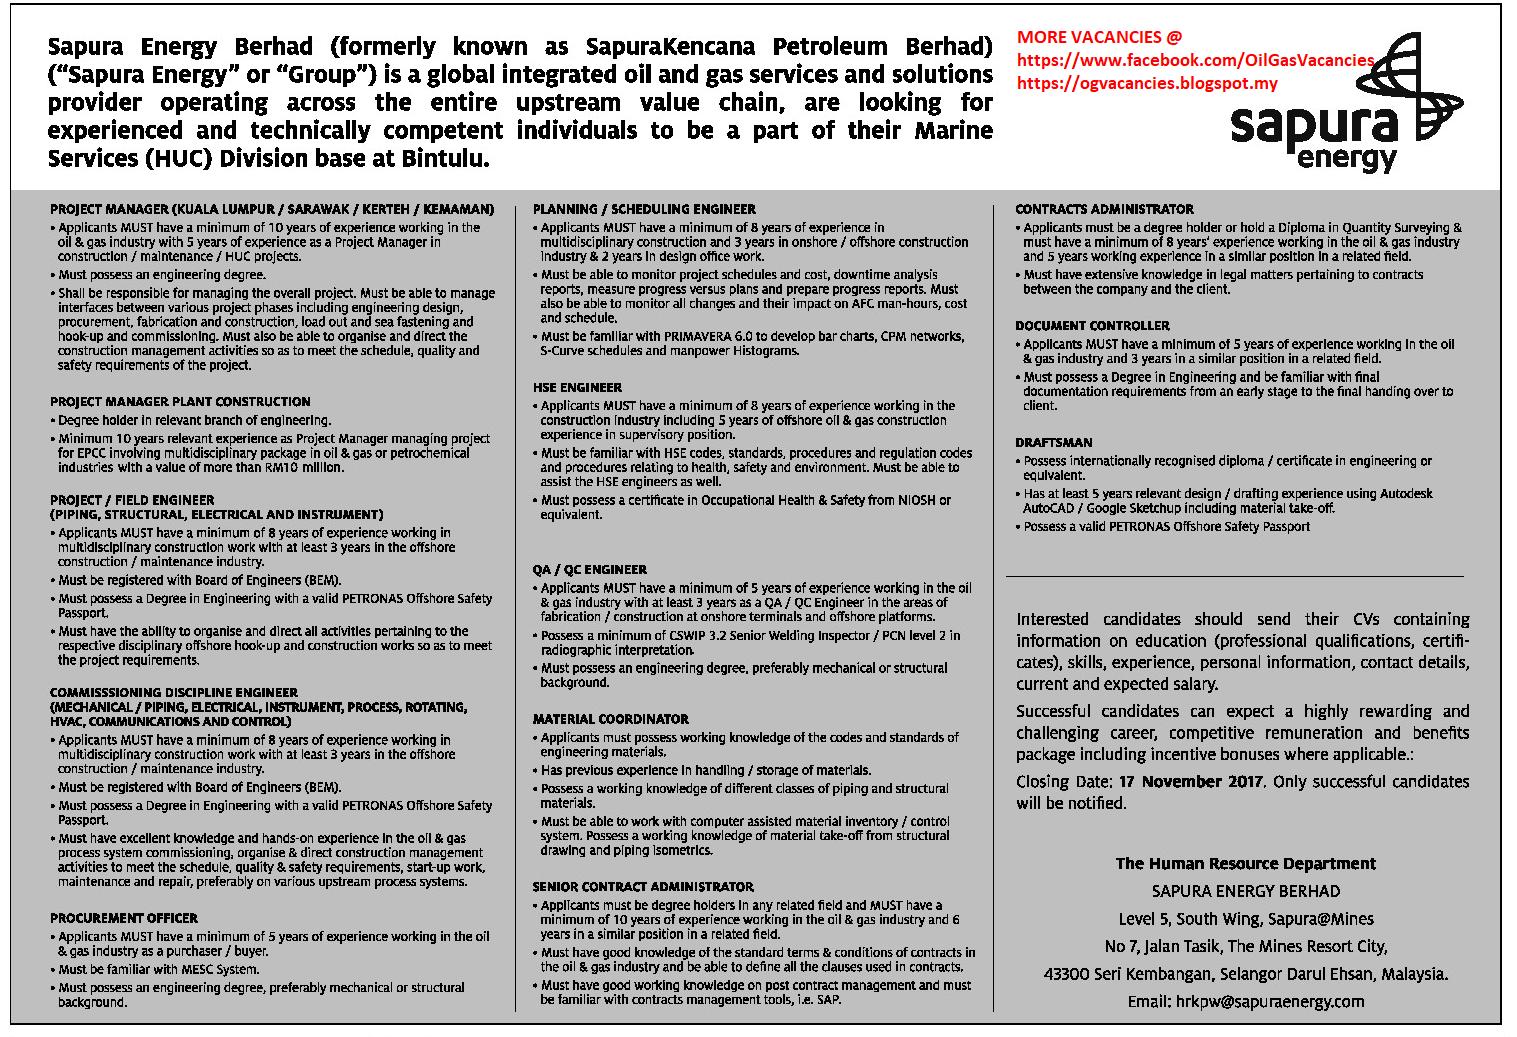 Oil &Gas Vacancies: Vacancies - Sapura Energy - Bintulu